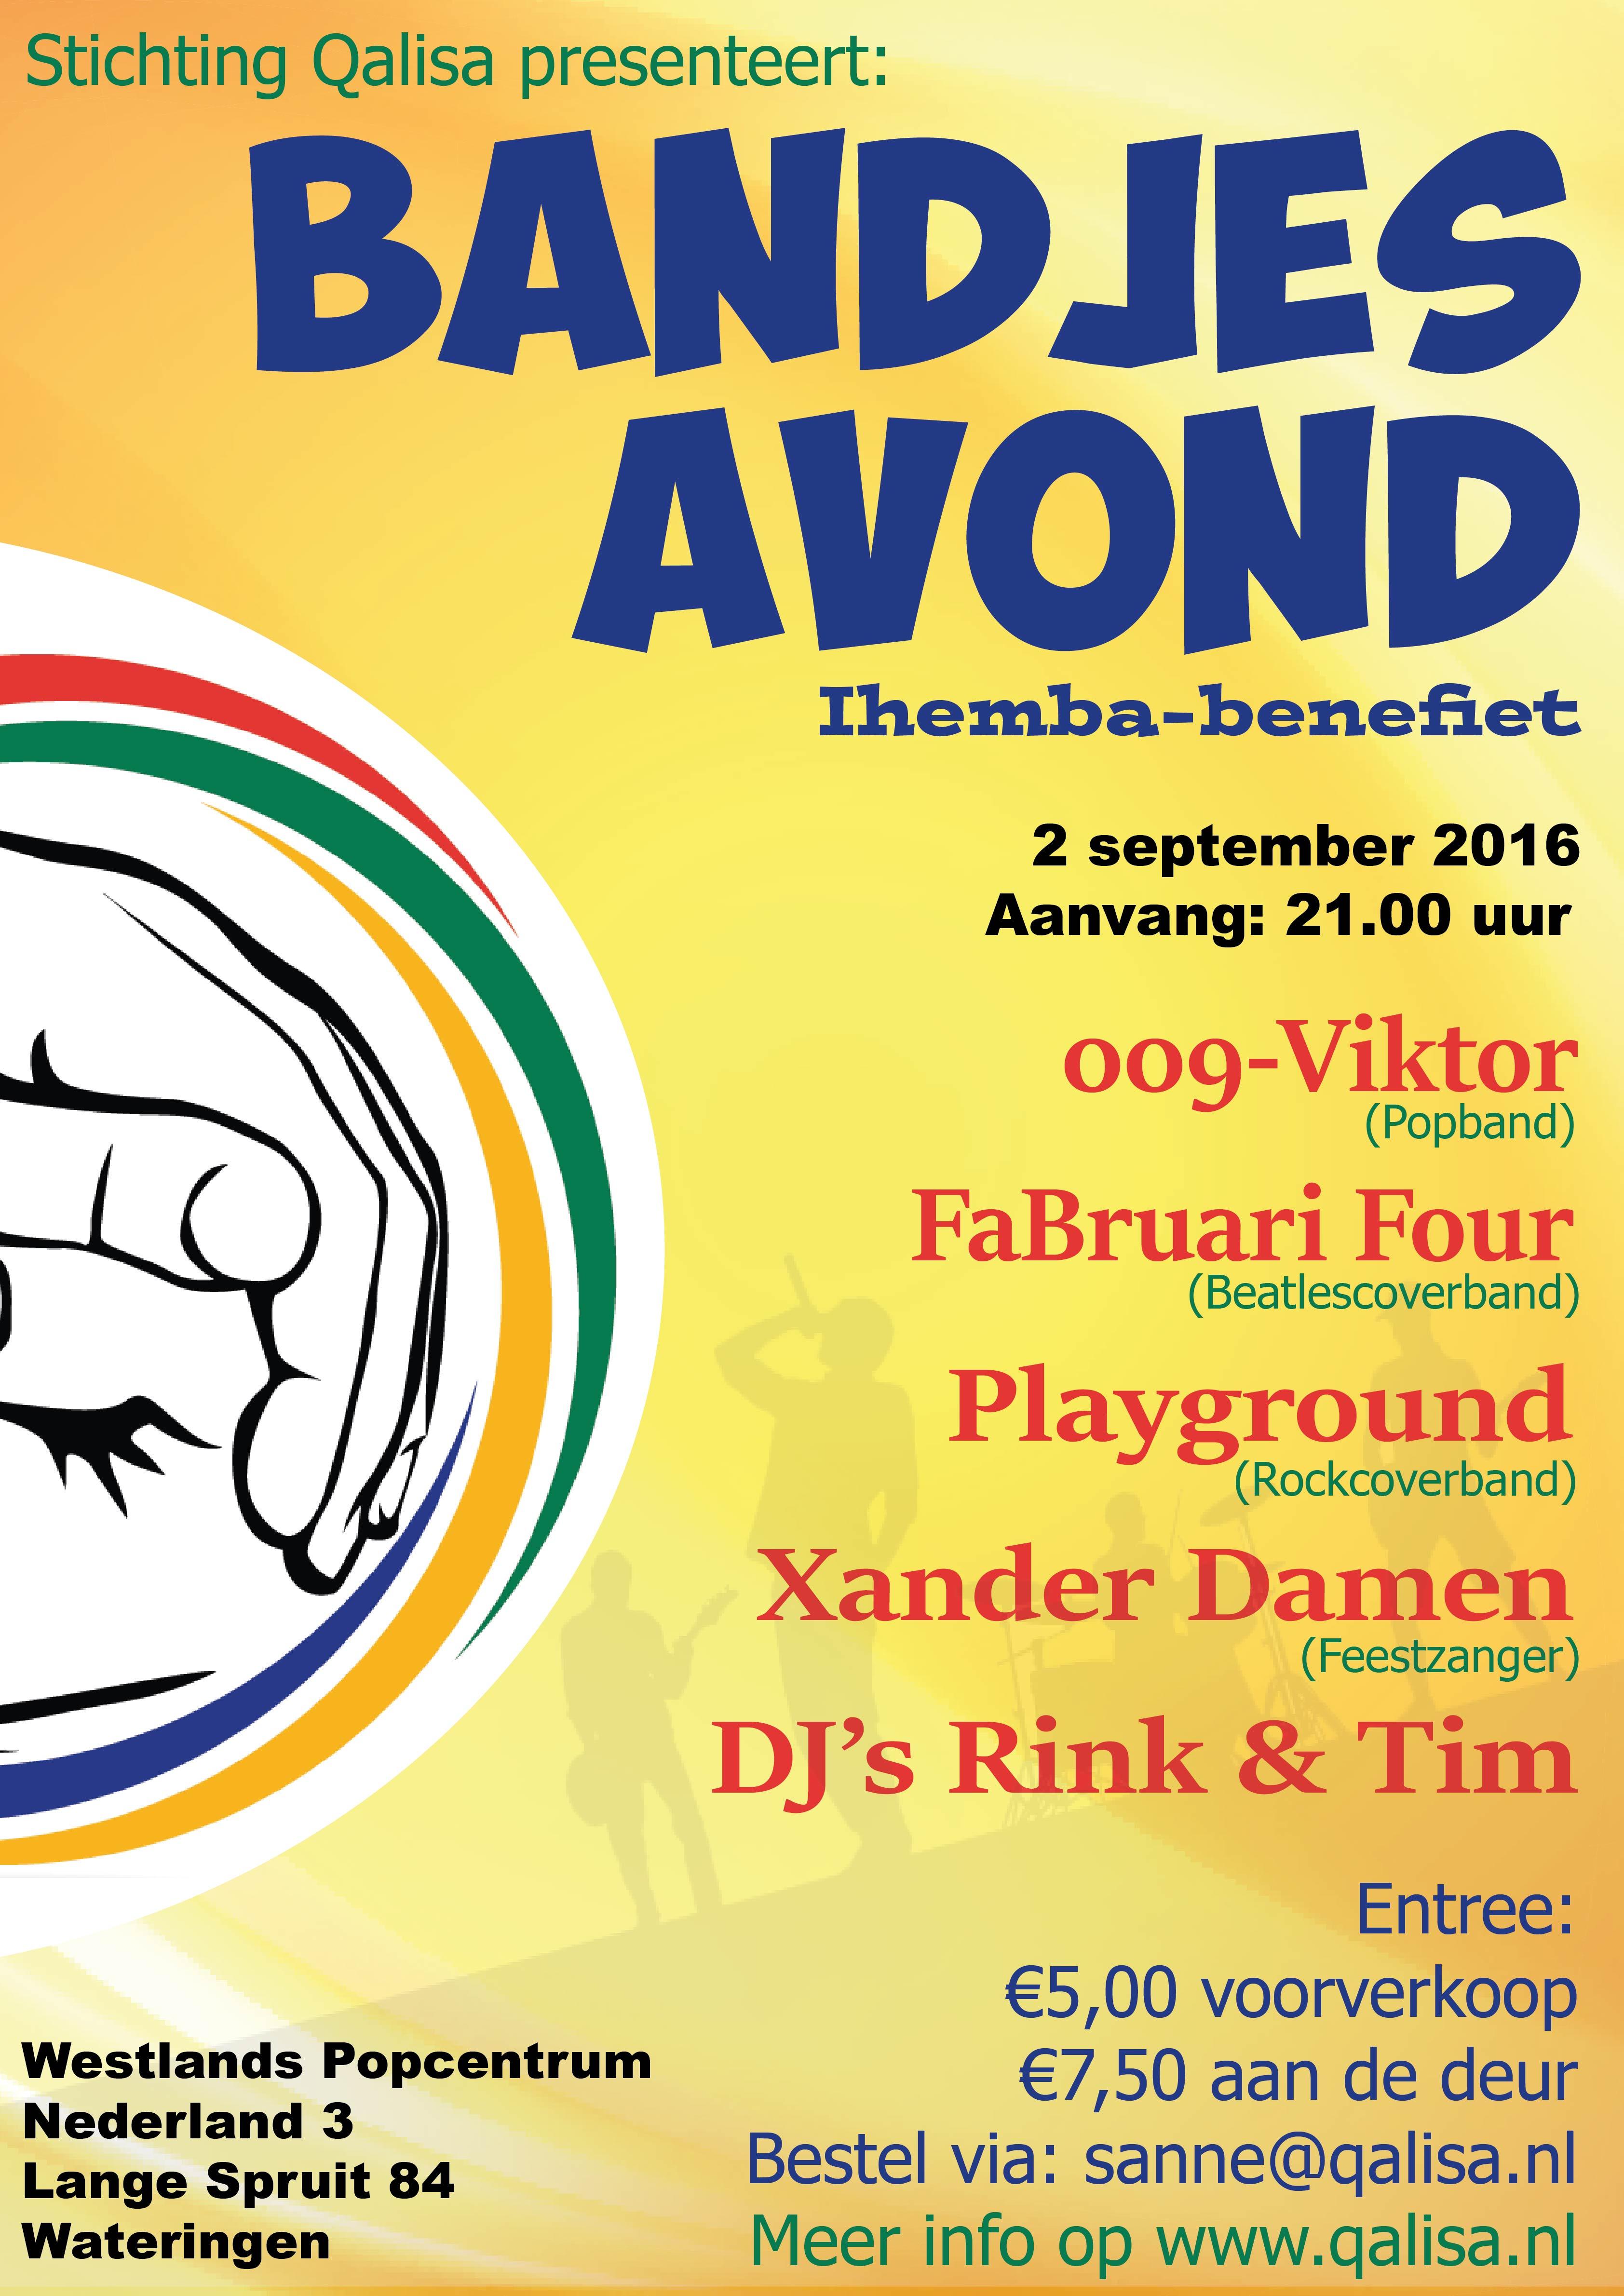 Bandjesavond voor Ithemba